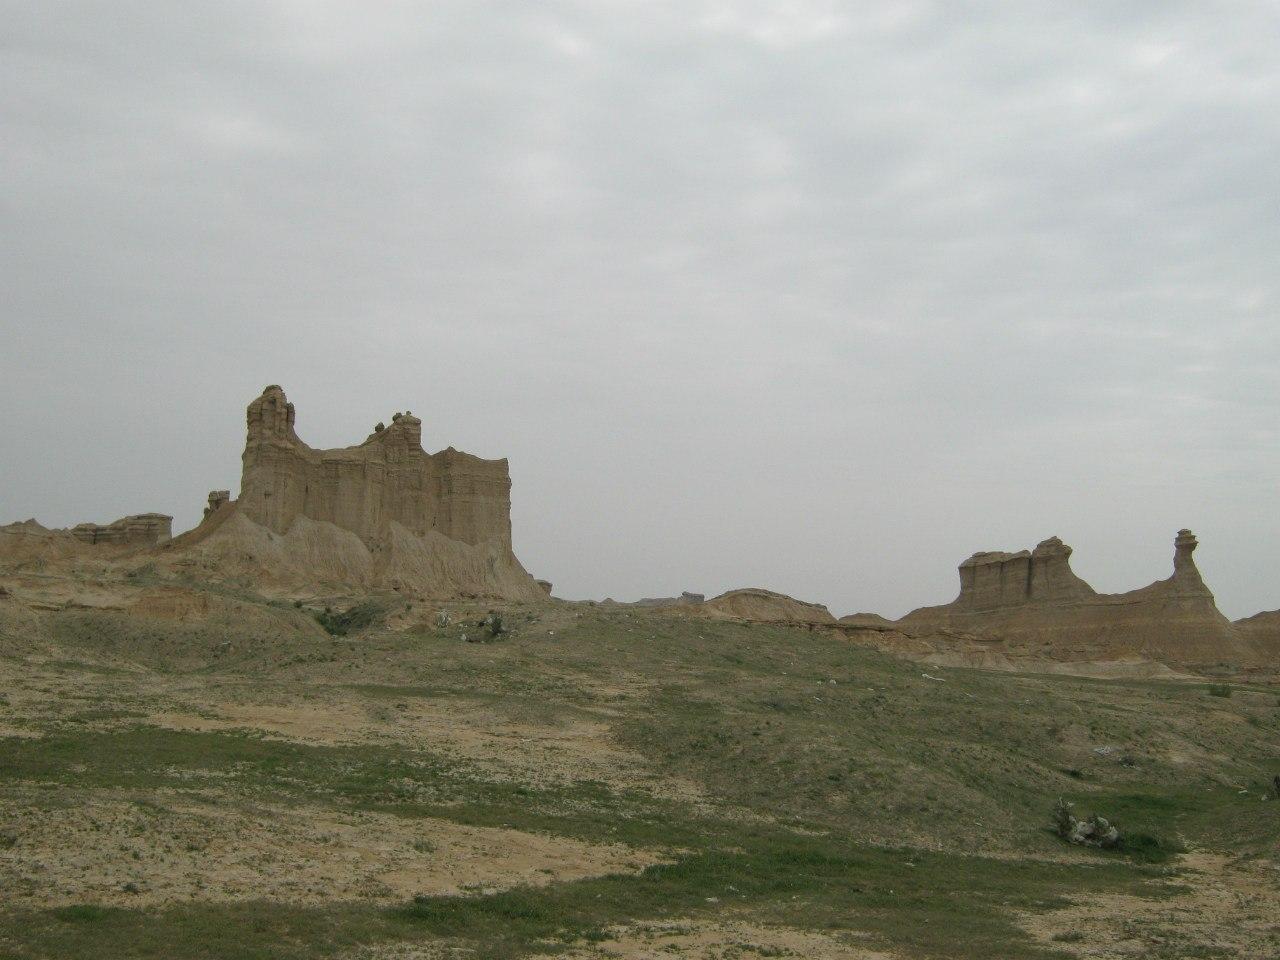 Красоты у дороги Бушер-Ахваз